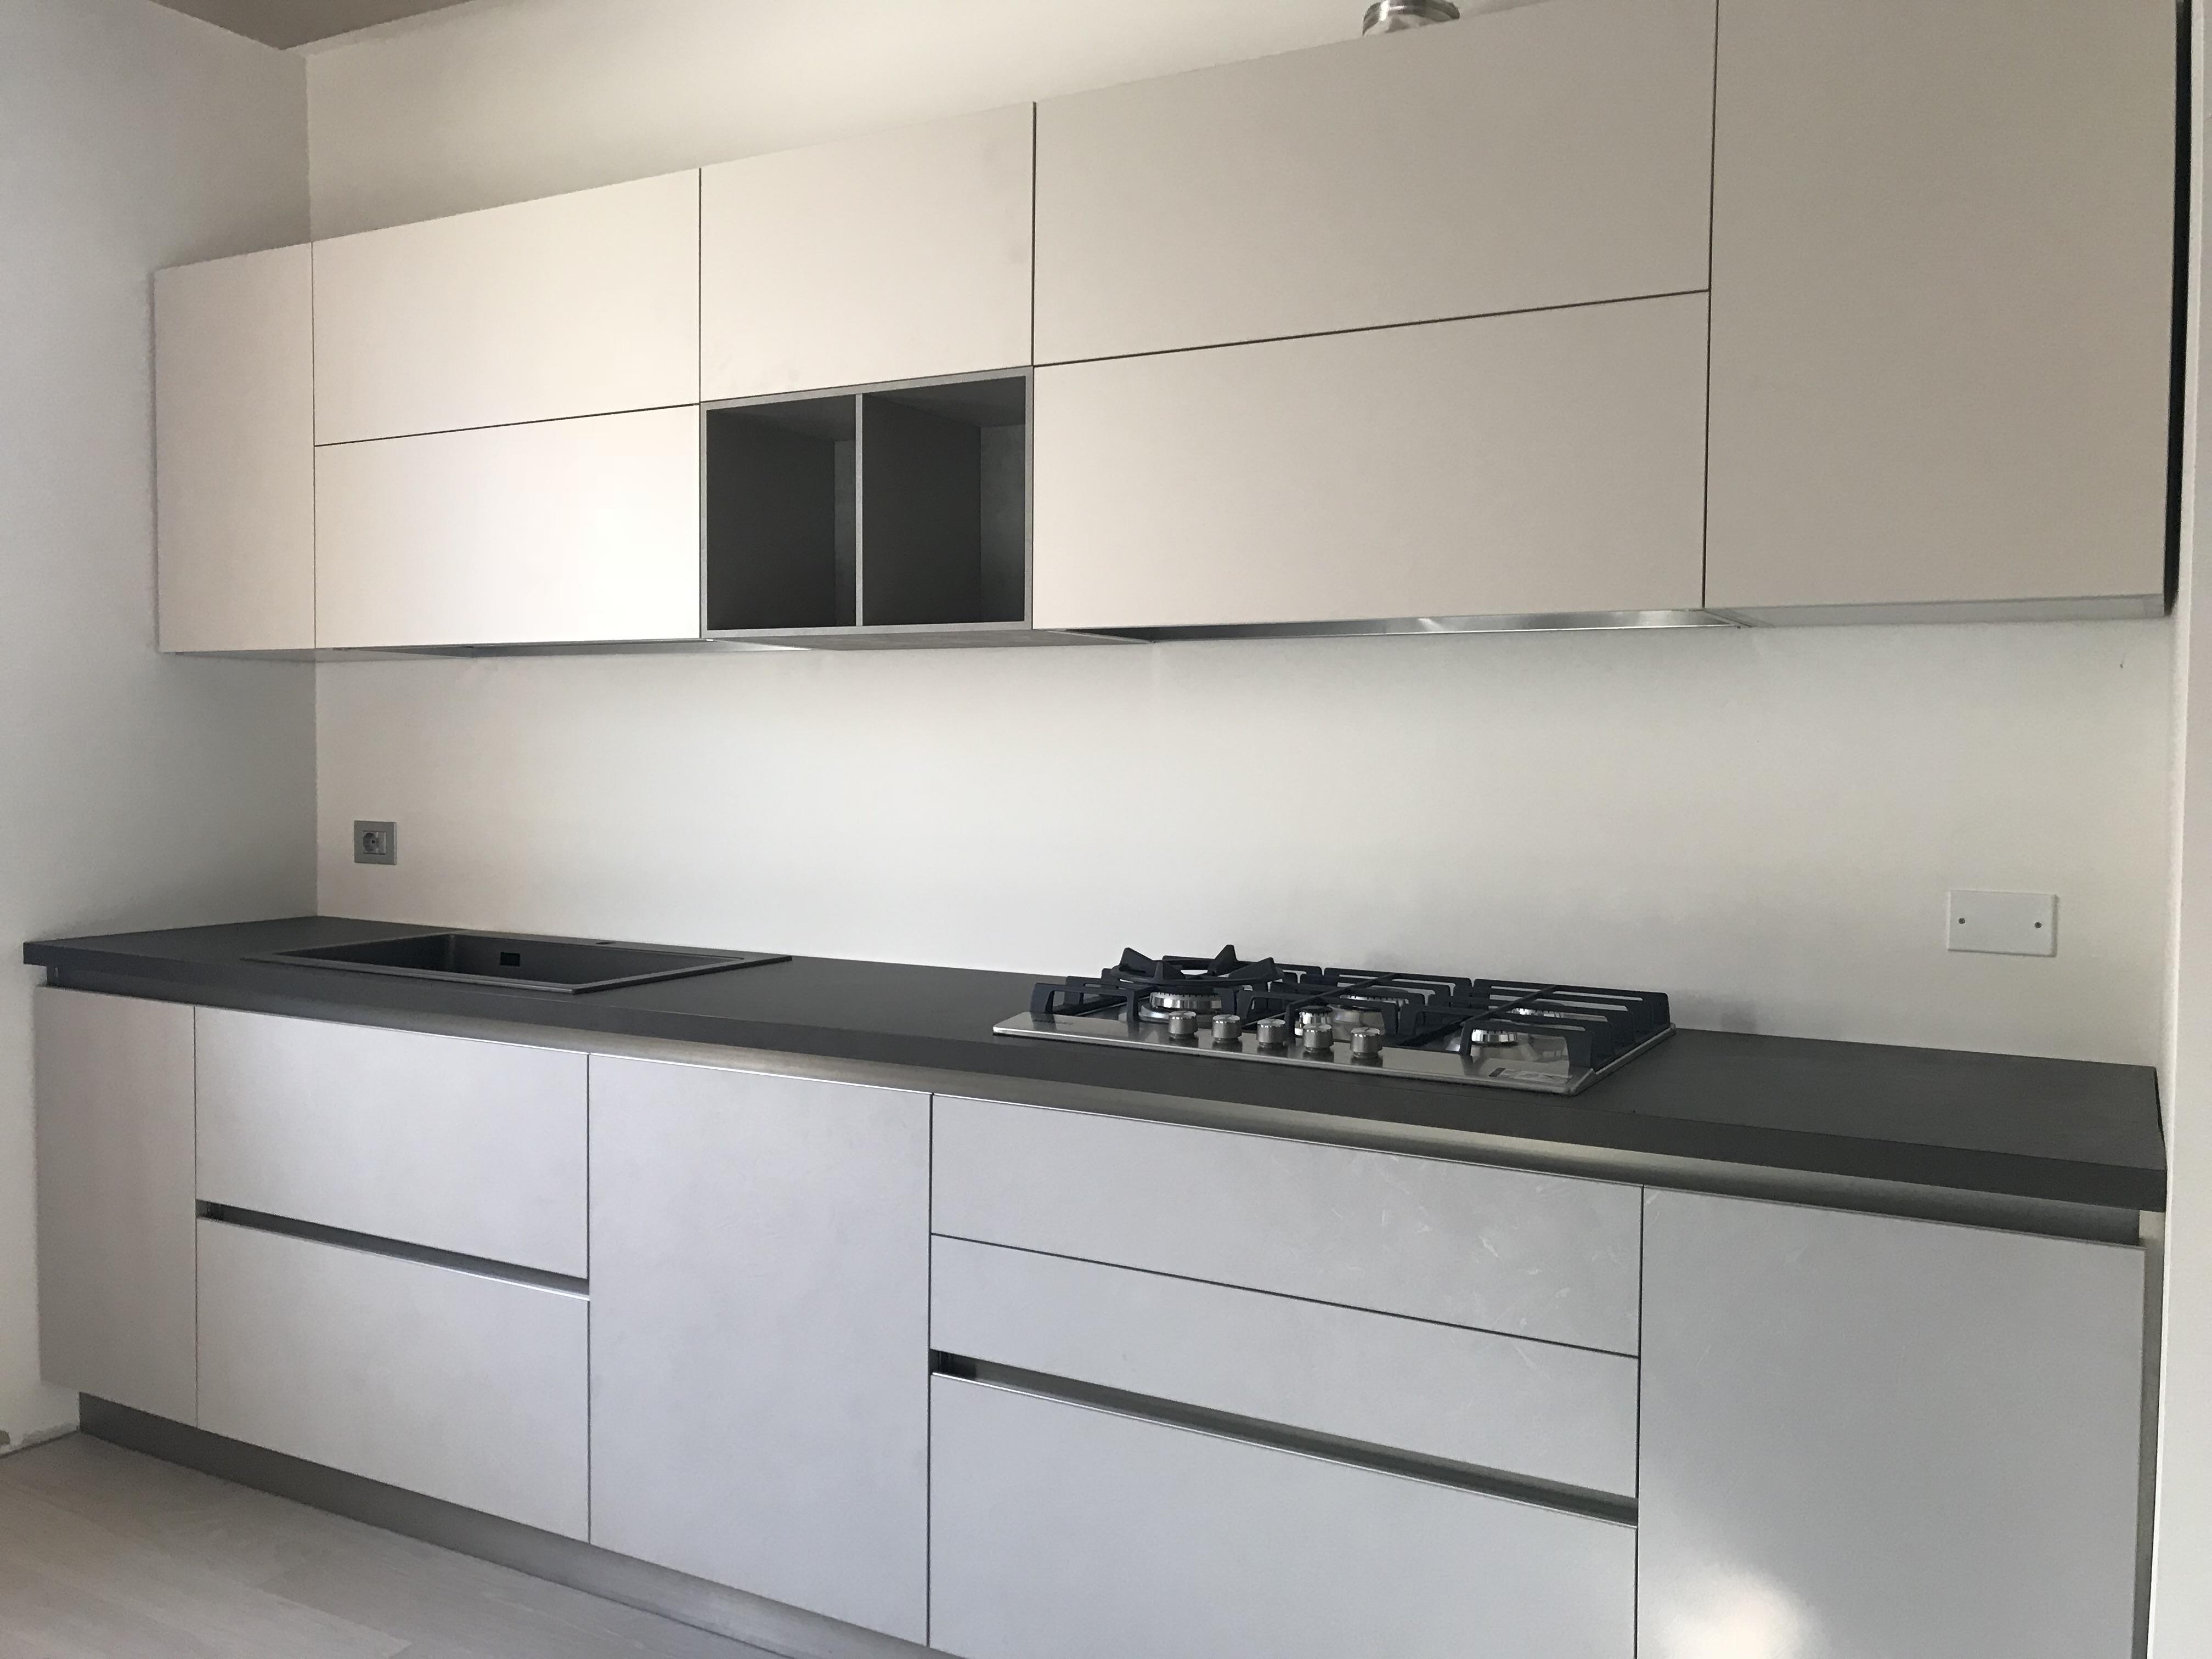 Cucina - Arredamento Brescia   CREAZIONE D\'INTERNI